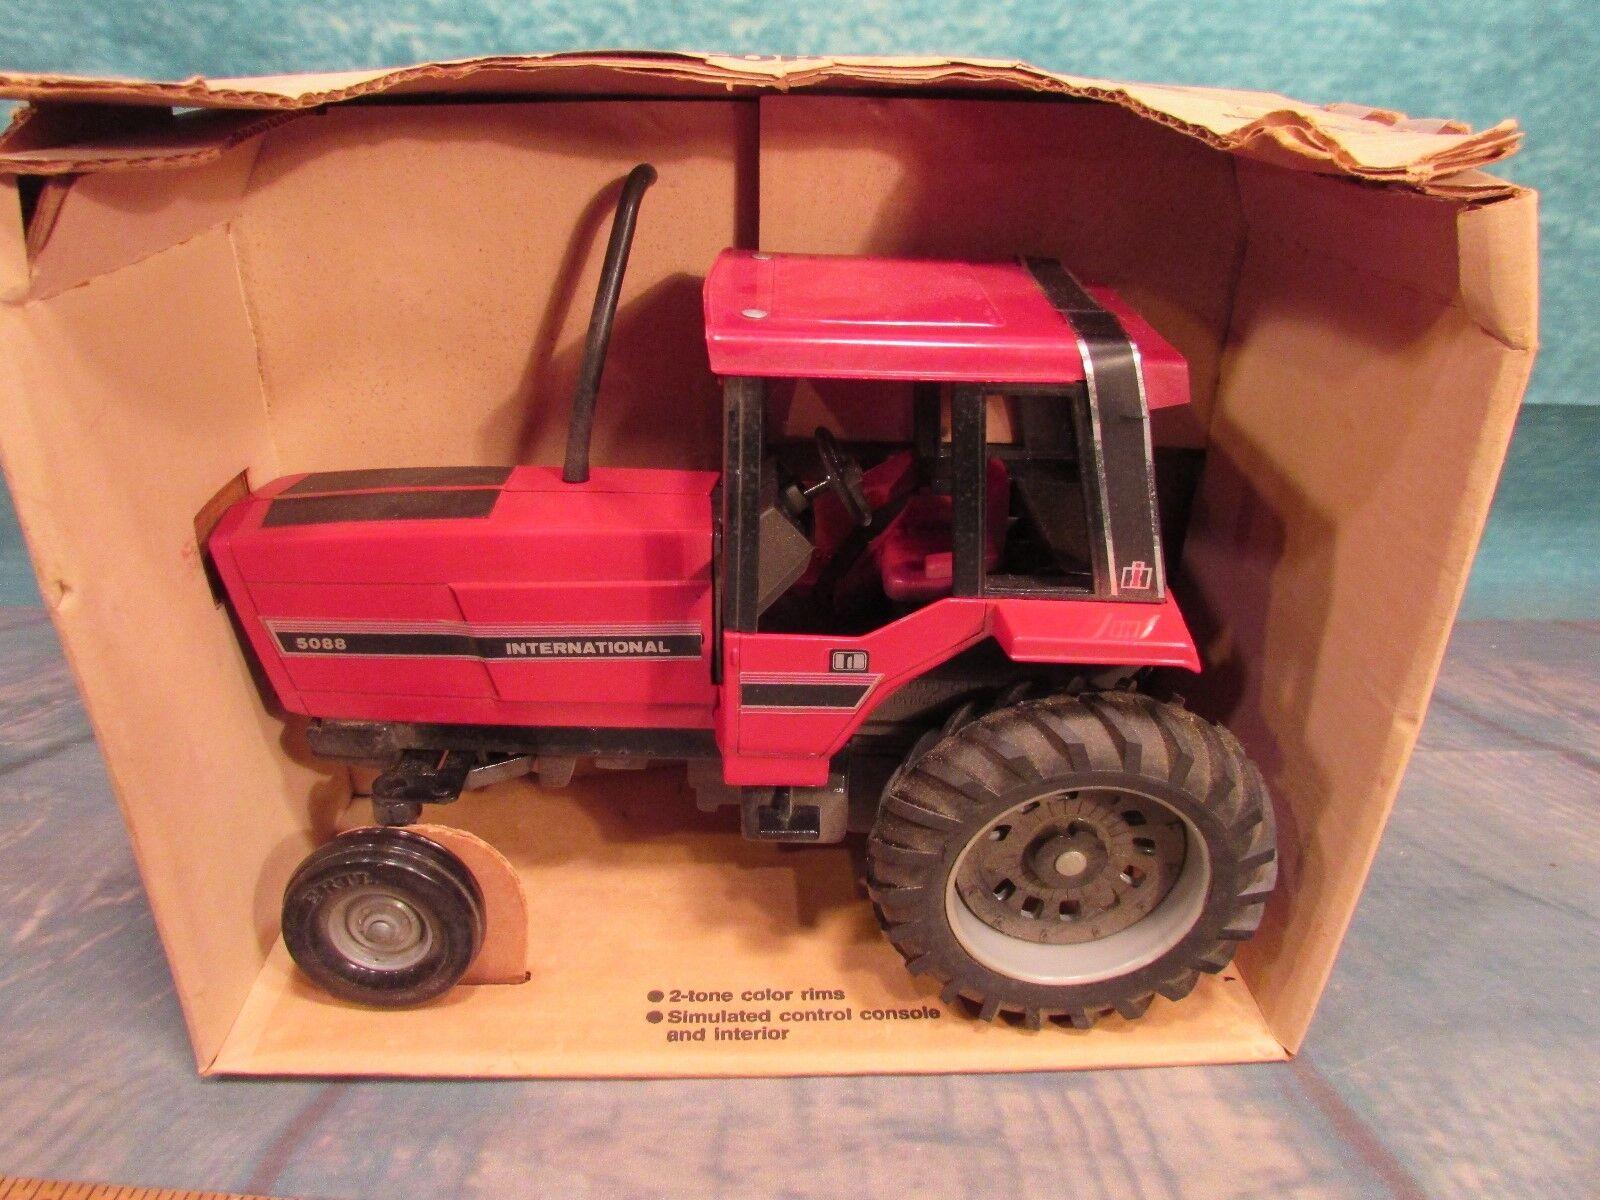 Vintage NIB Ertl 5088 tractor International Harvester IH toy Die Cast Iowa 468